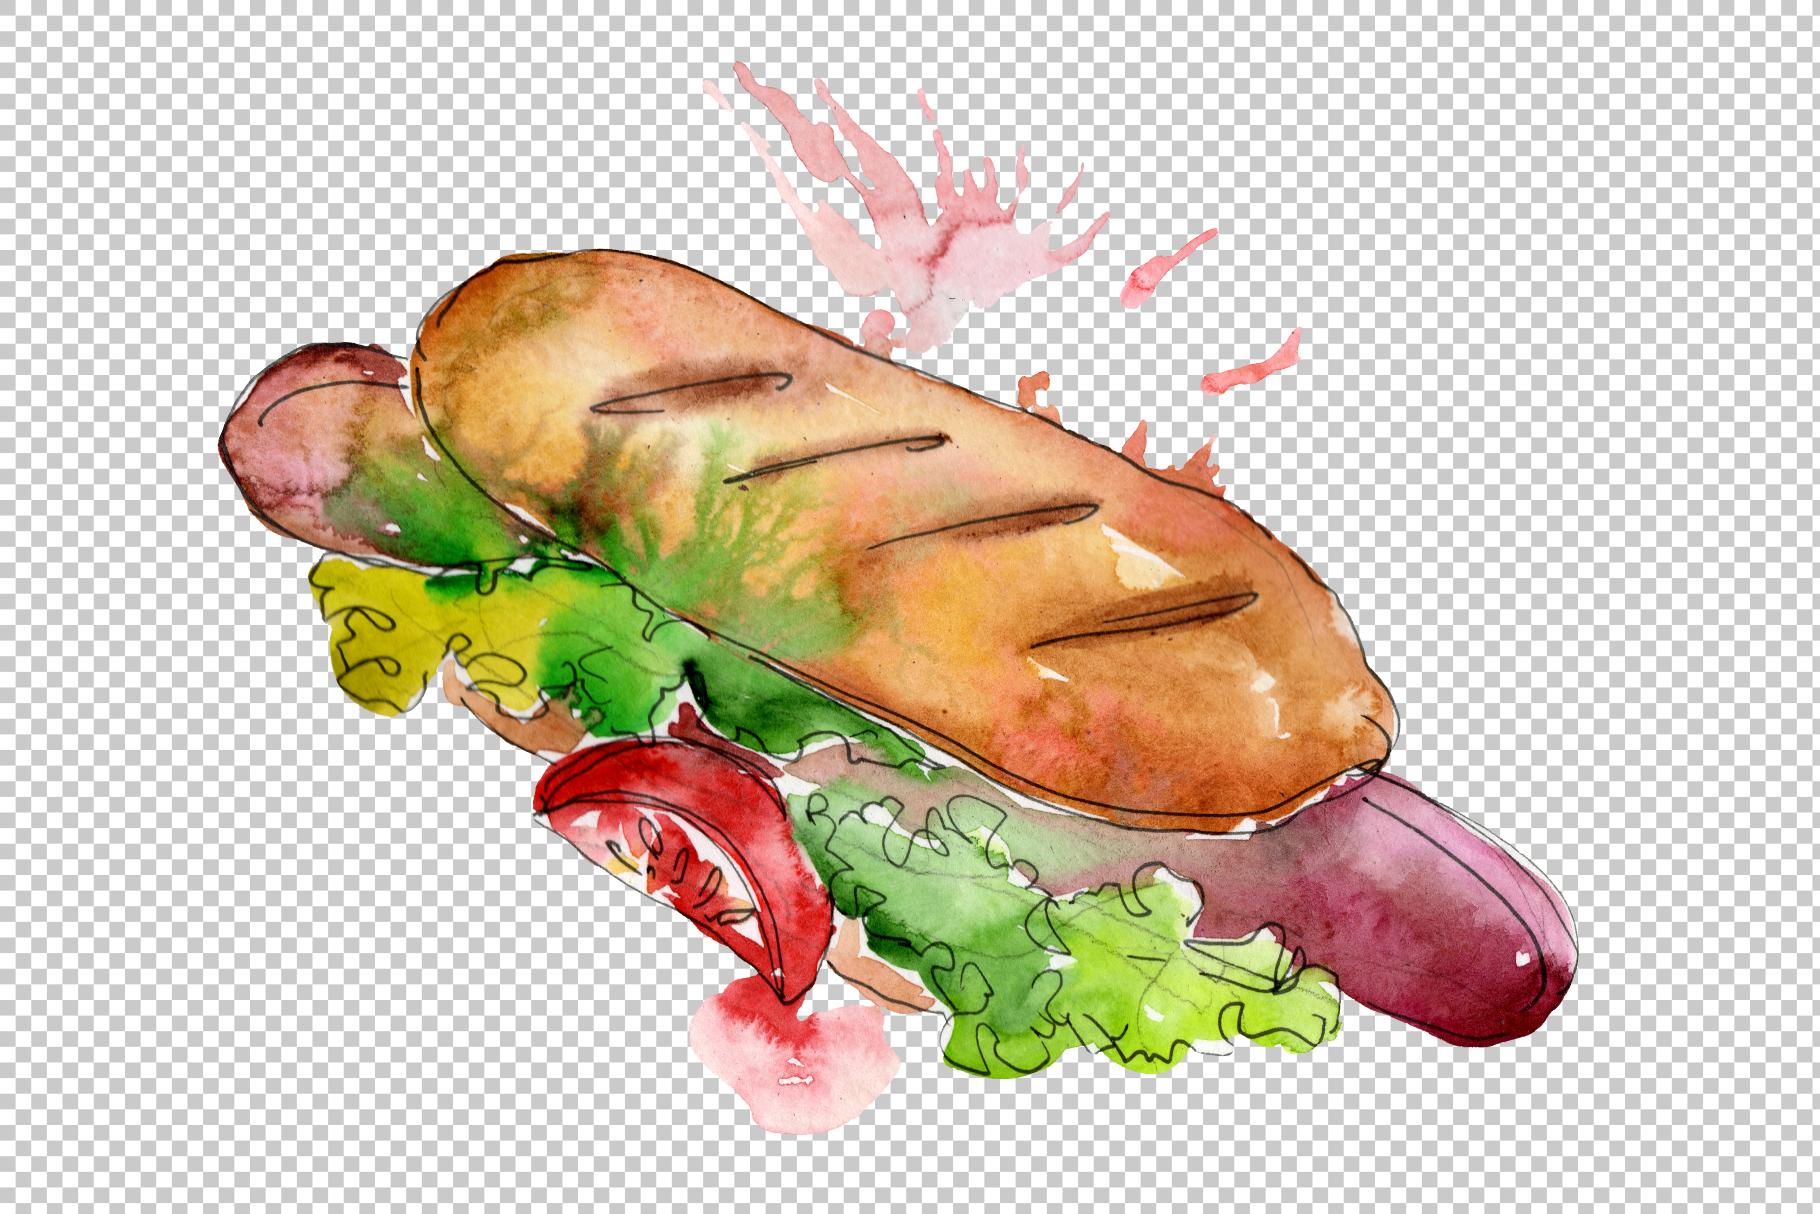 Hot dog in Ukrainian watercolor png example image 6